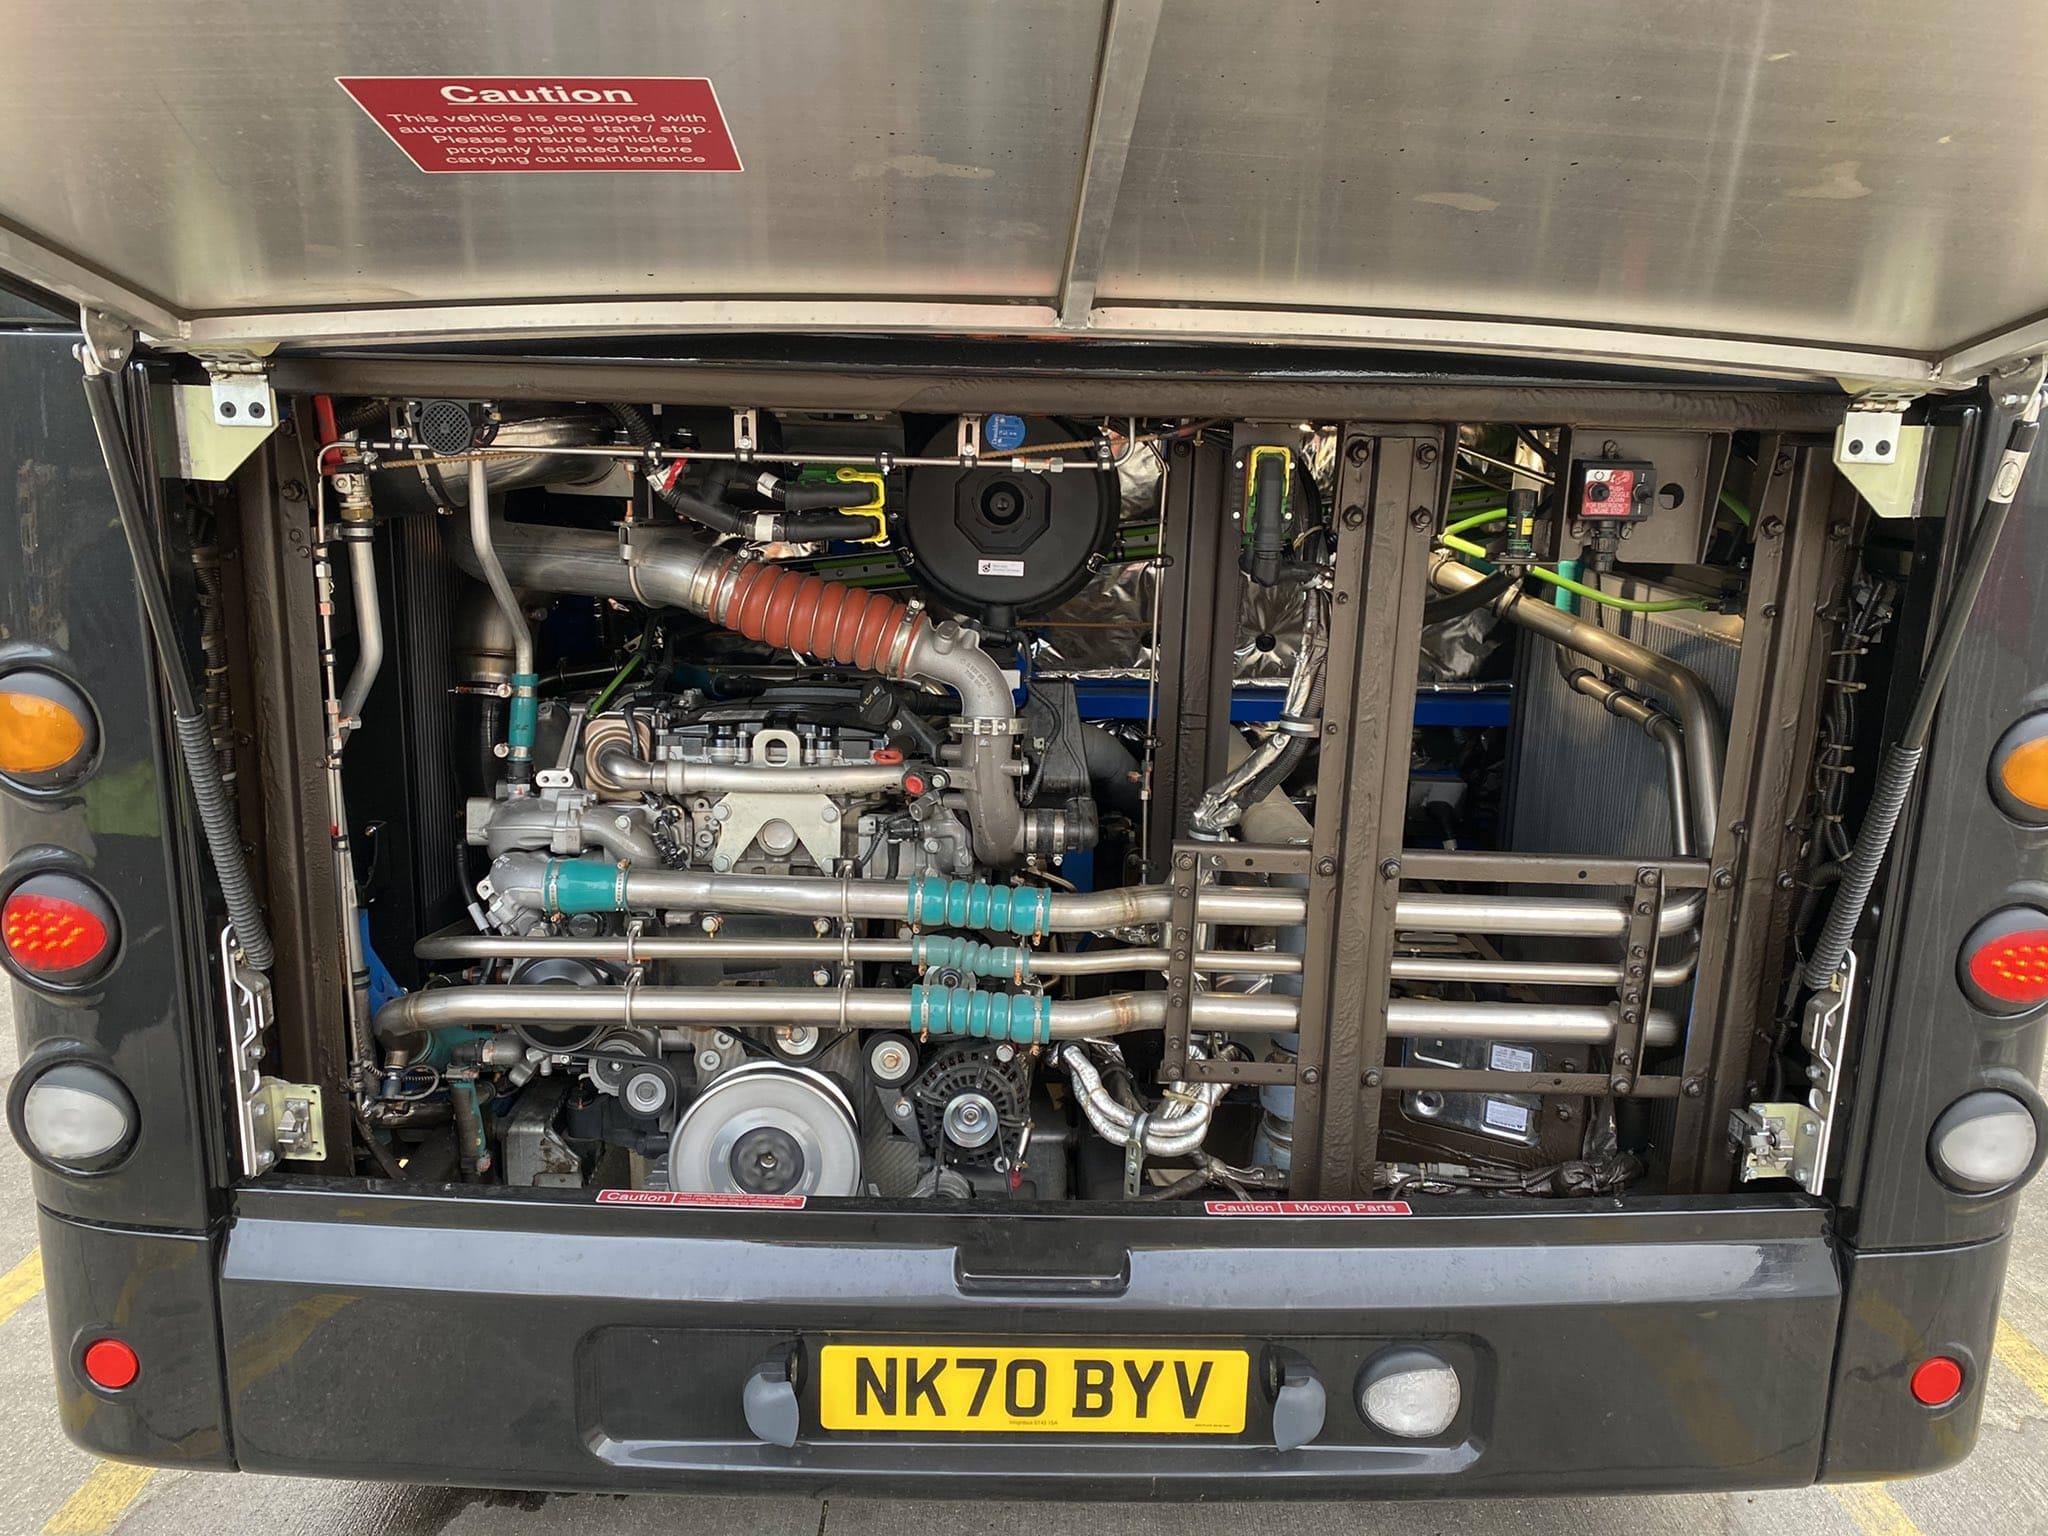 StreetDeck engine